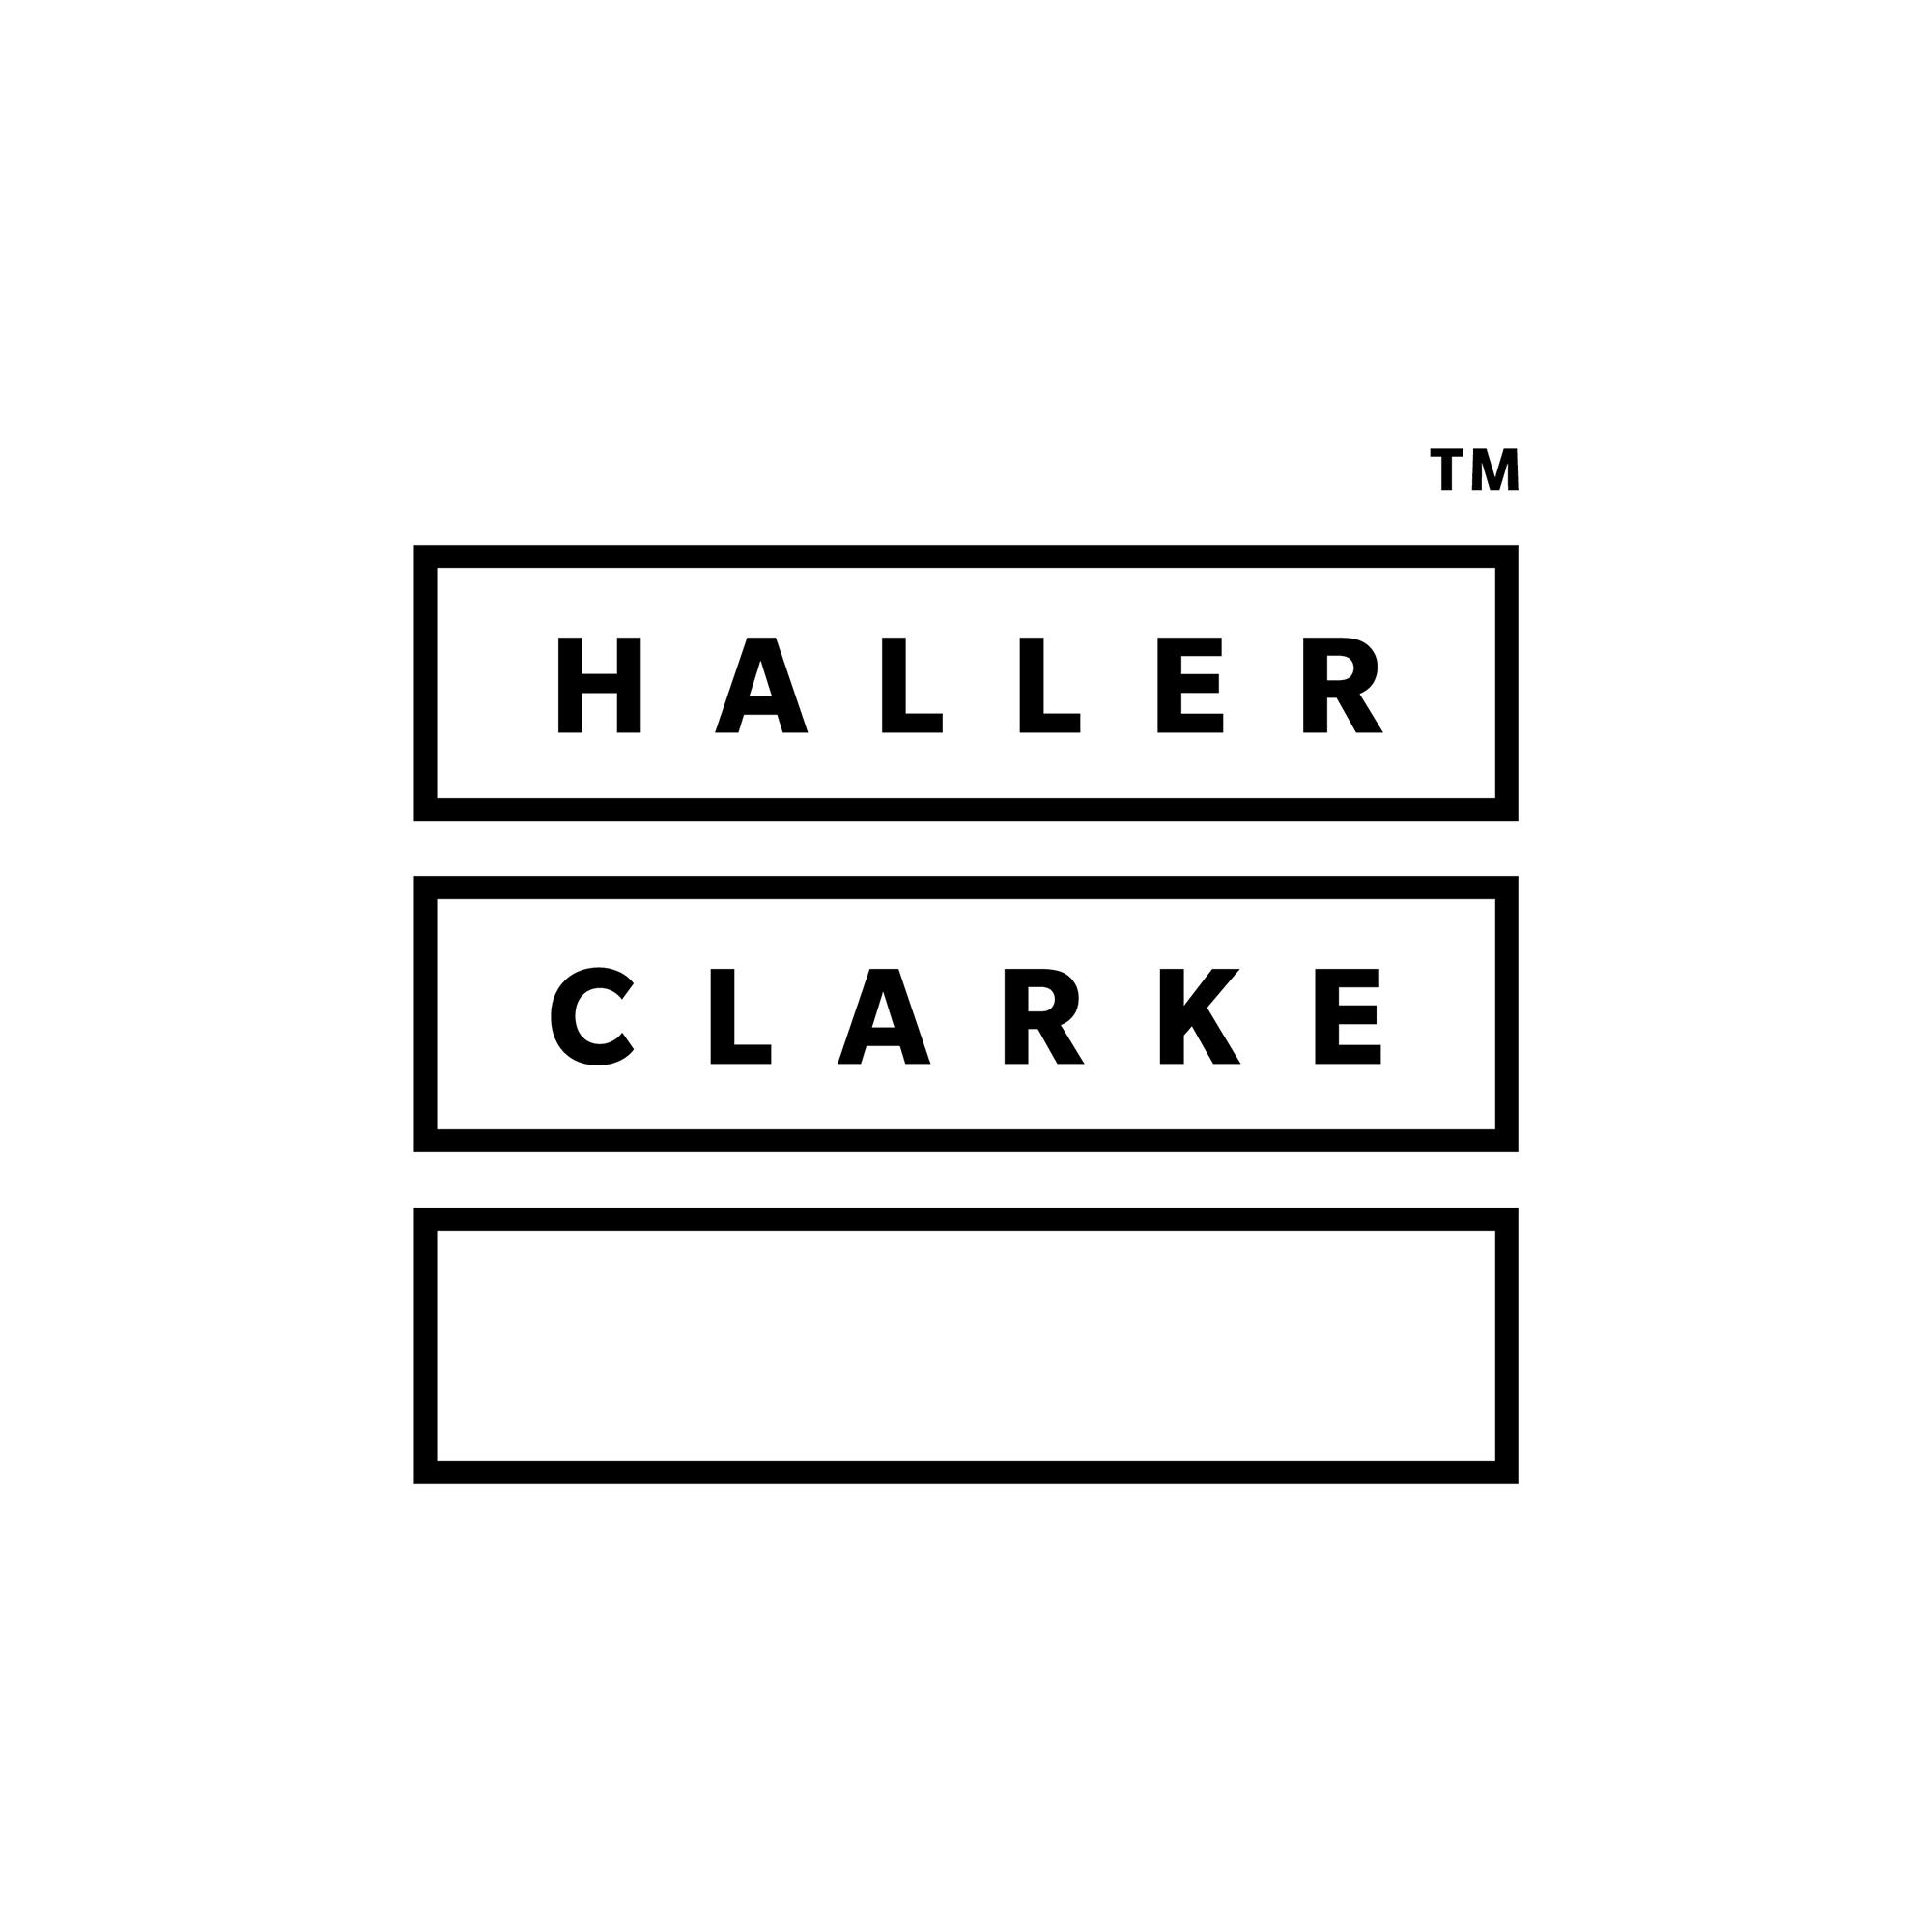 Cover image: Haller Clarke Identity